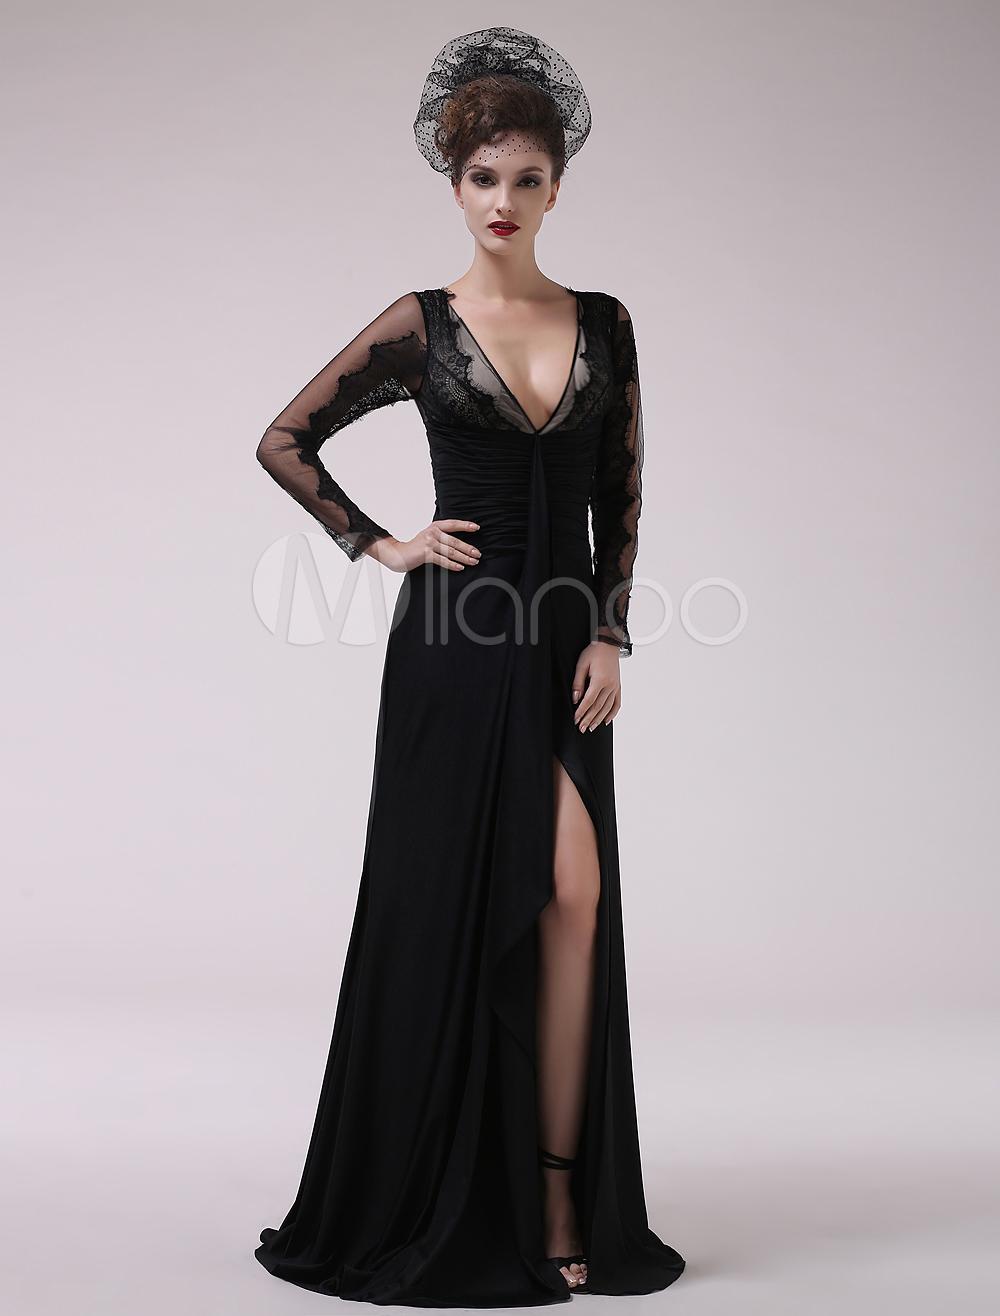 Black Pleated V-Neck Sheath Chiffon Beautiful Evening Dress For Women  Milanoo